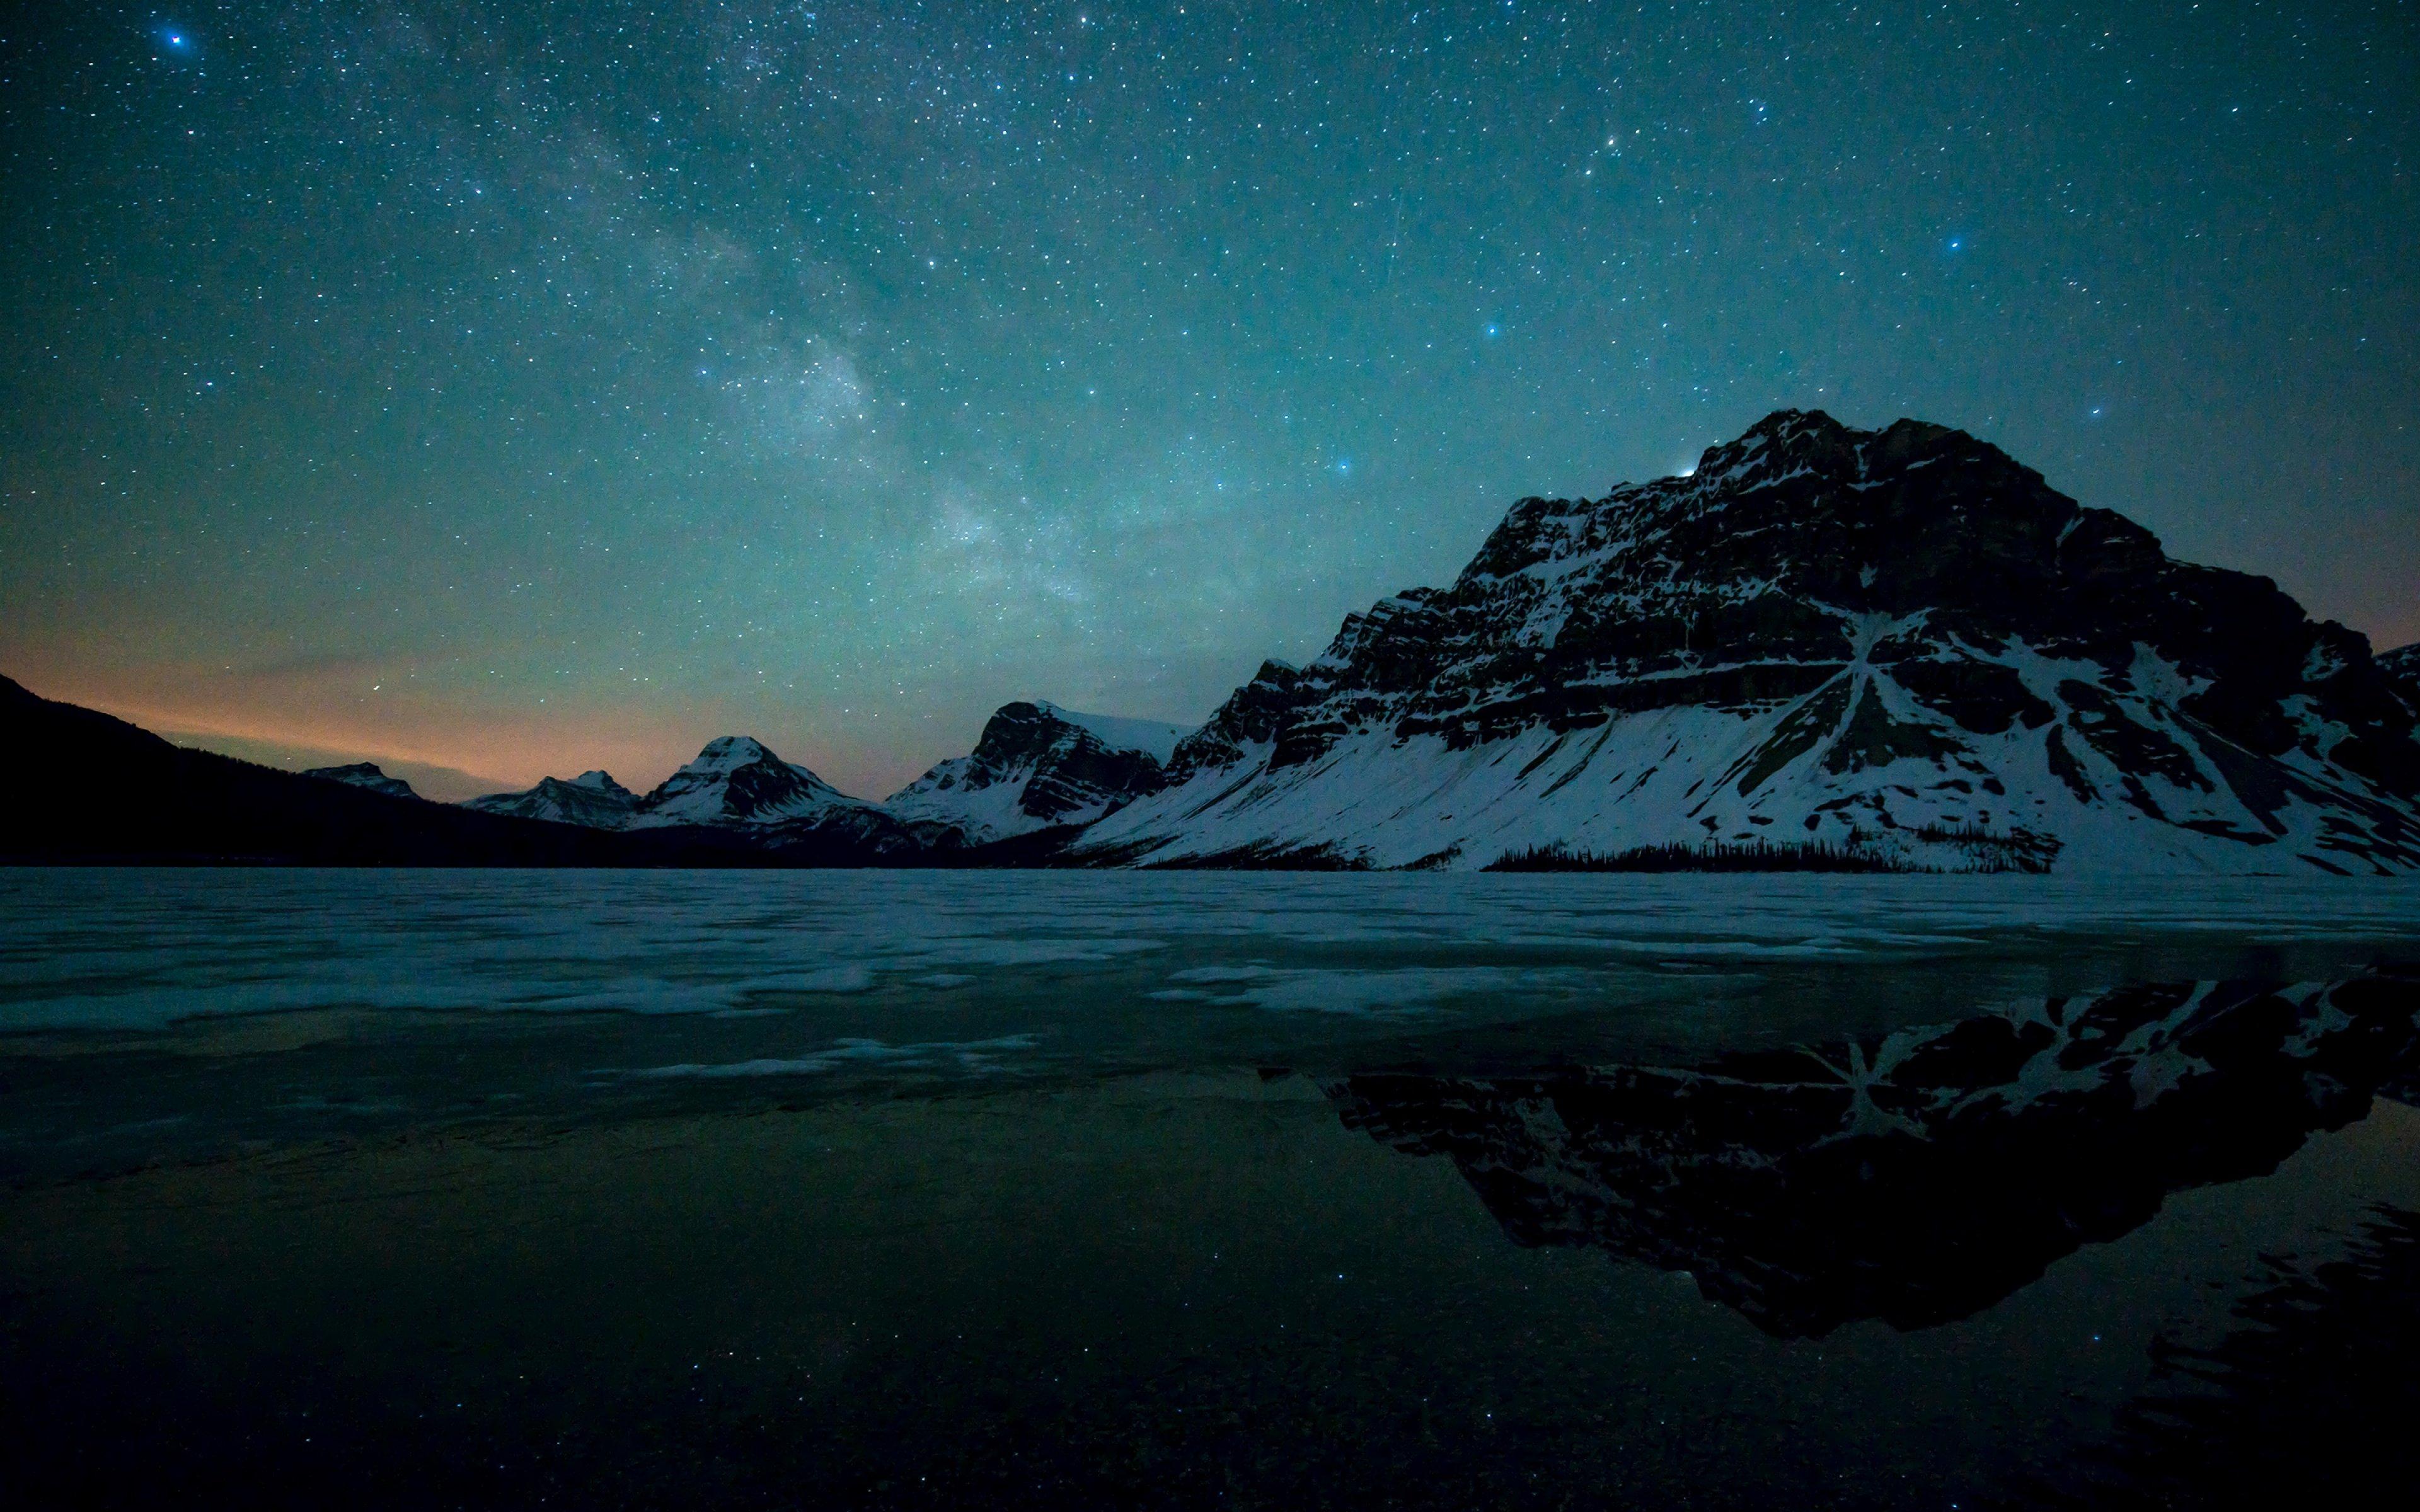 Reflection Nature Water Landscape Mountain Winter Stars Sky Night Wallpaper